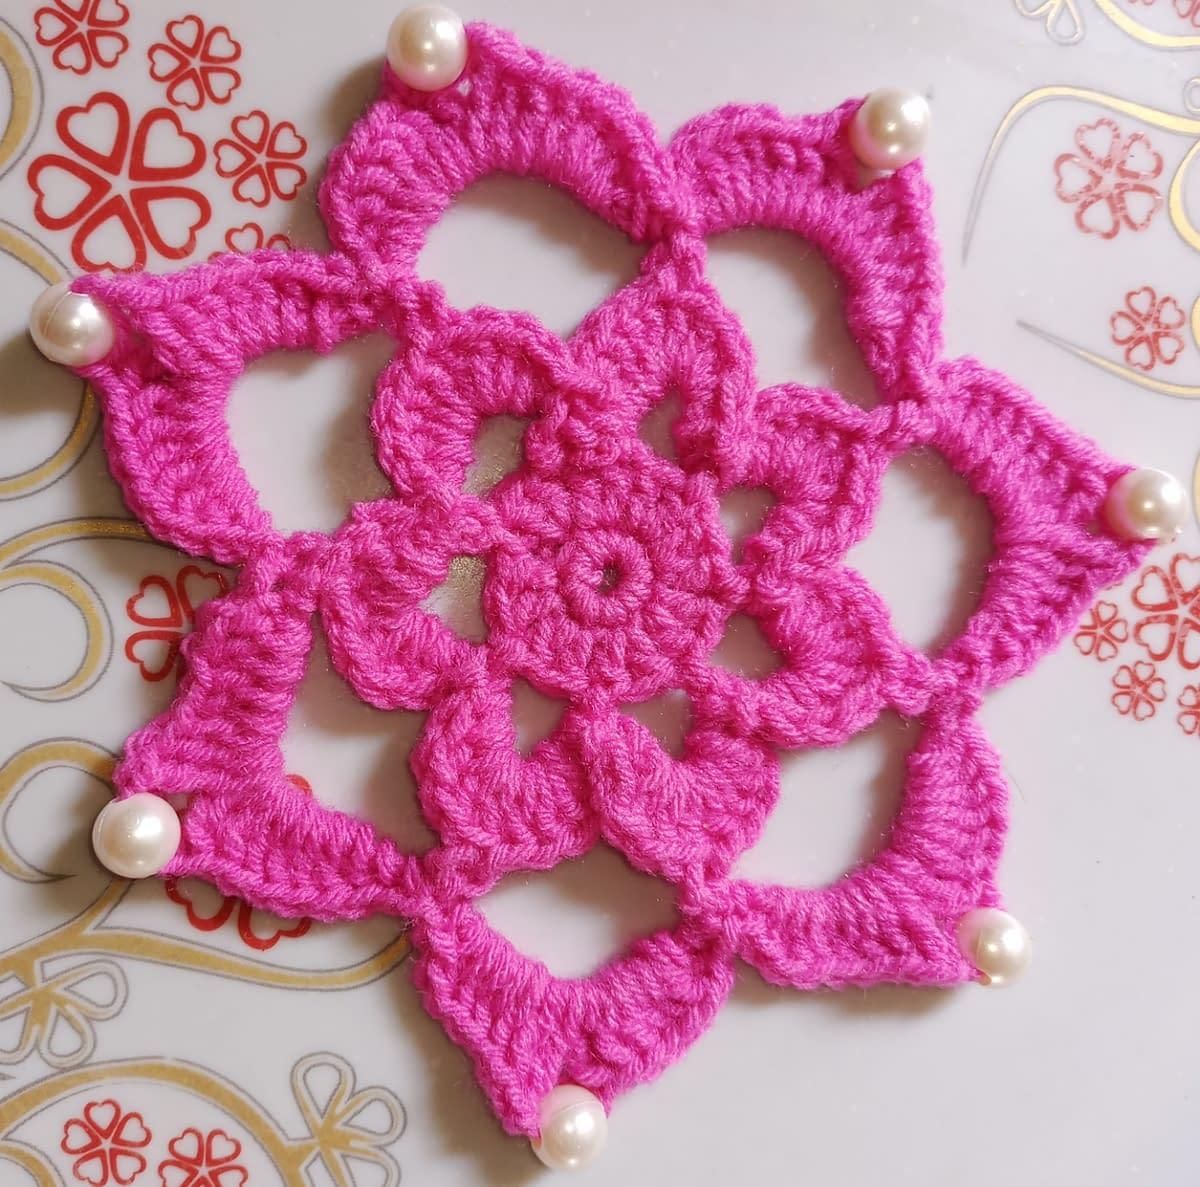 Handmade Crochet coaster 4